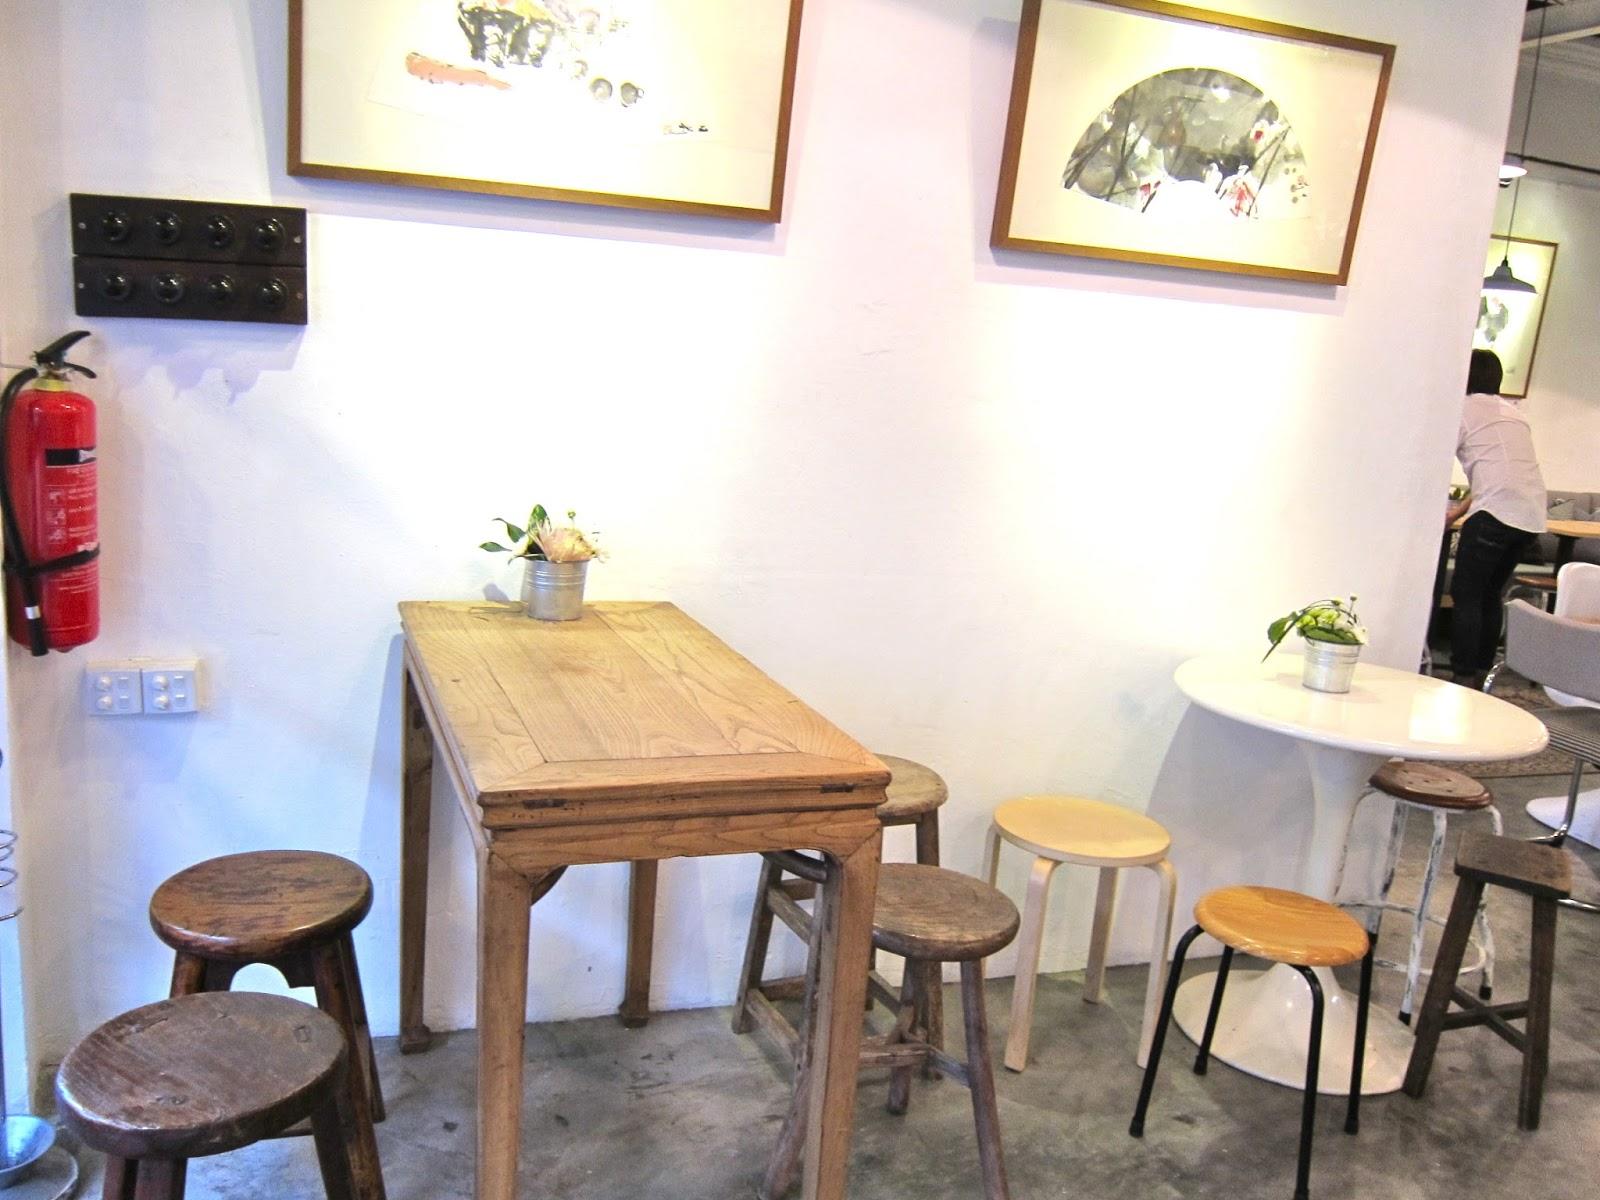 Sharing all the good eats in Singapore!: Food Tasting: New Menu at ...